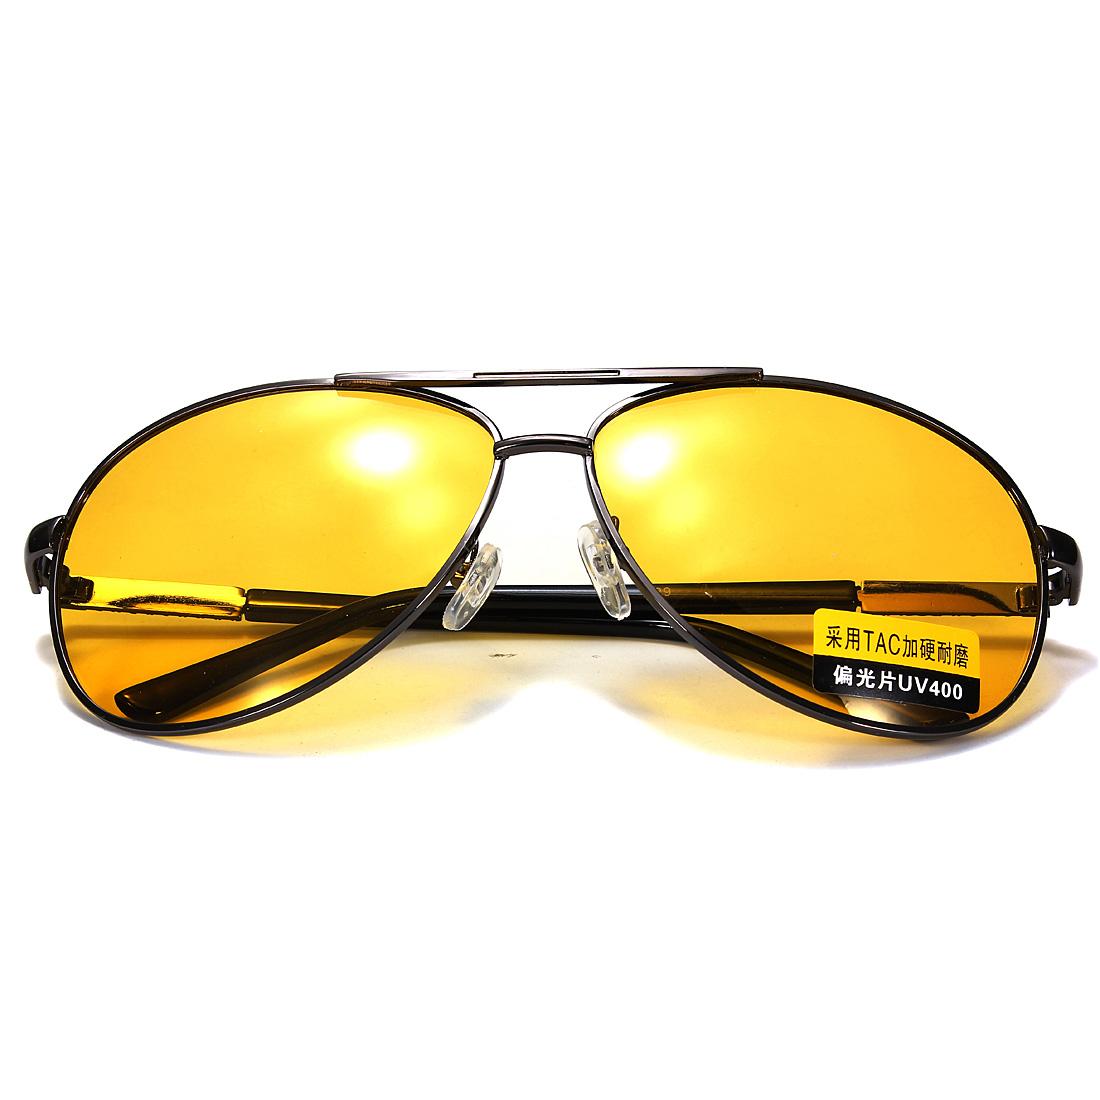 Fashion Men UV400 Yellow Lens Polarized Anti-Glare Night Vision Sunglasses Car Driving Eyeglasses